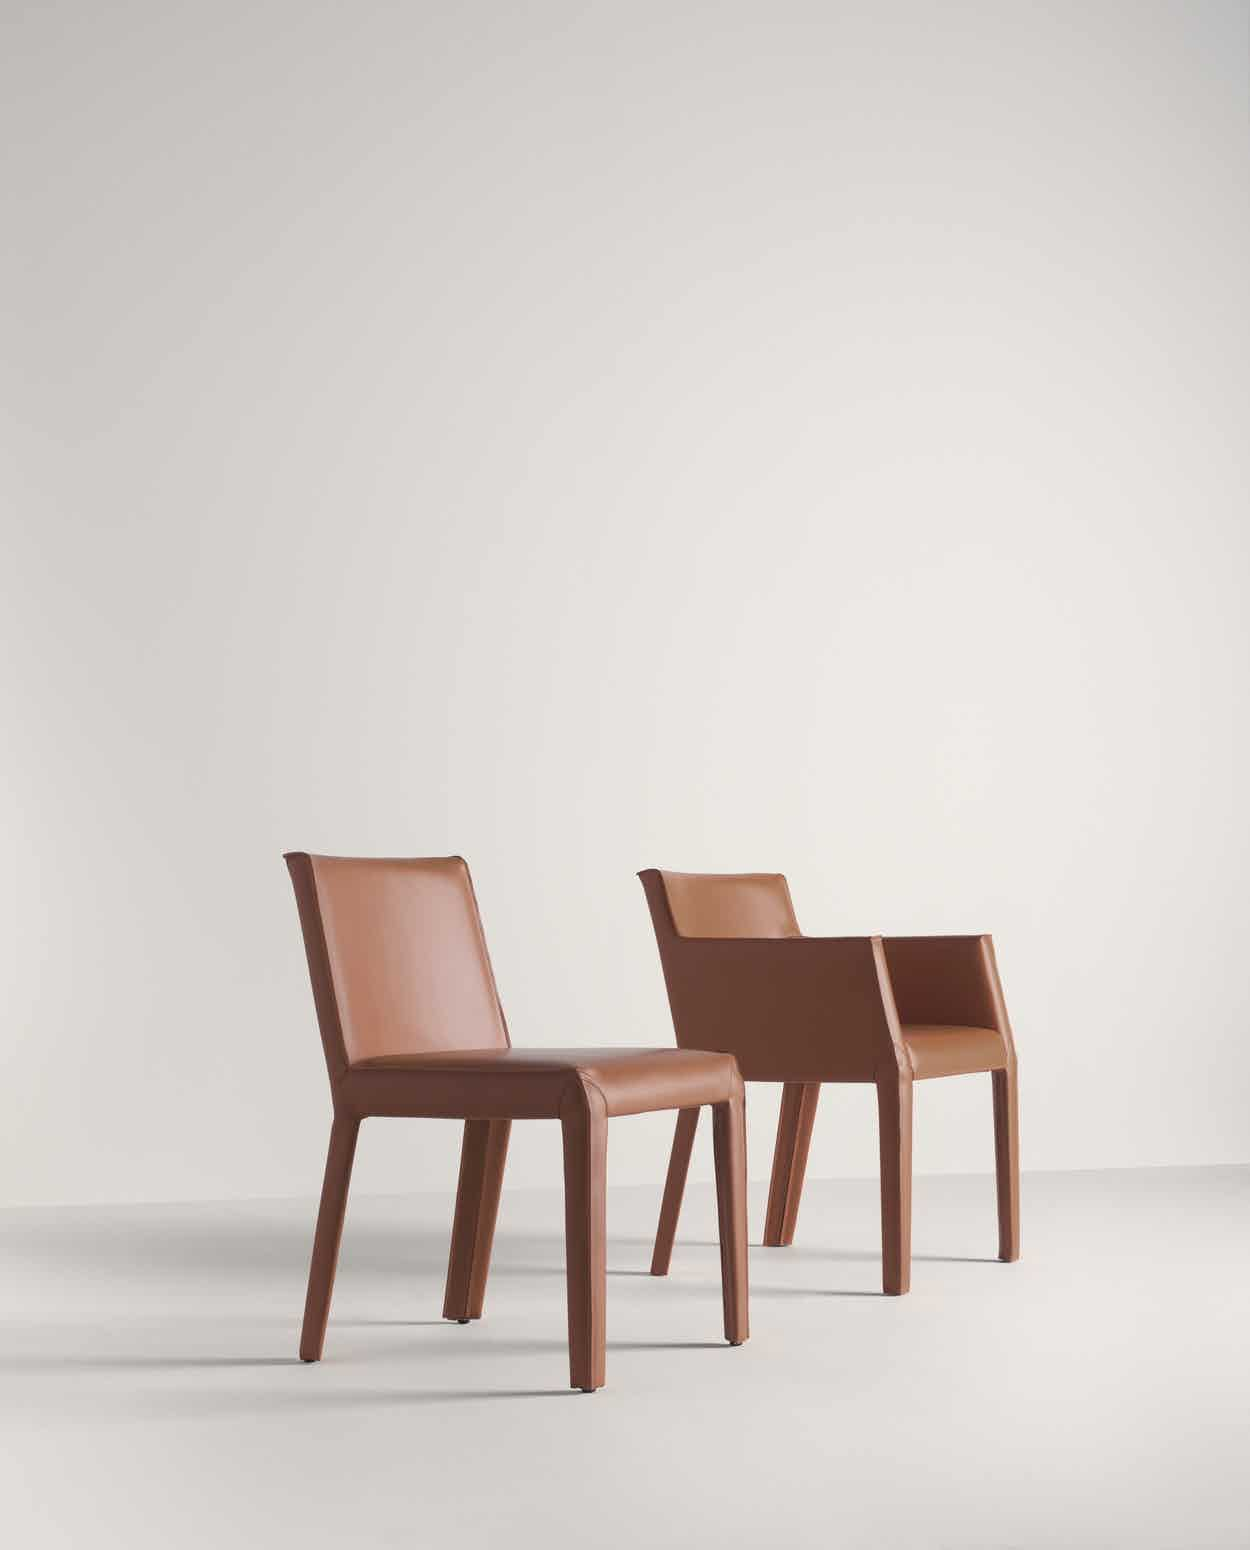 Frag-furniture-two-musa-p-chair-institu-haute-living